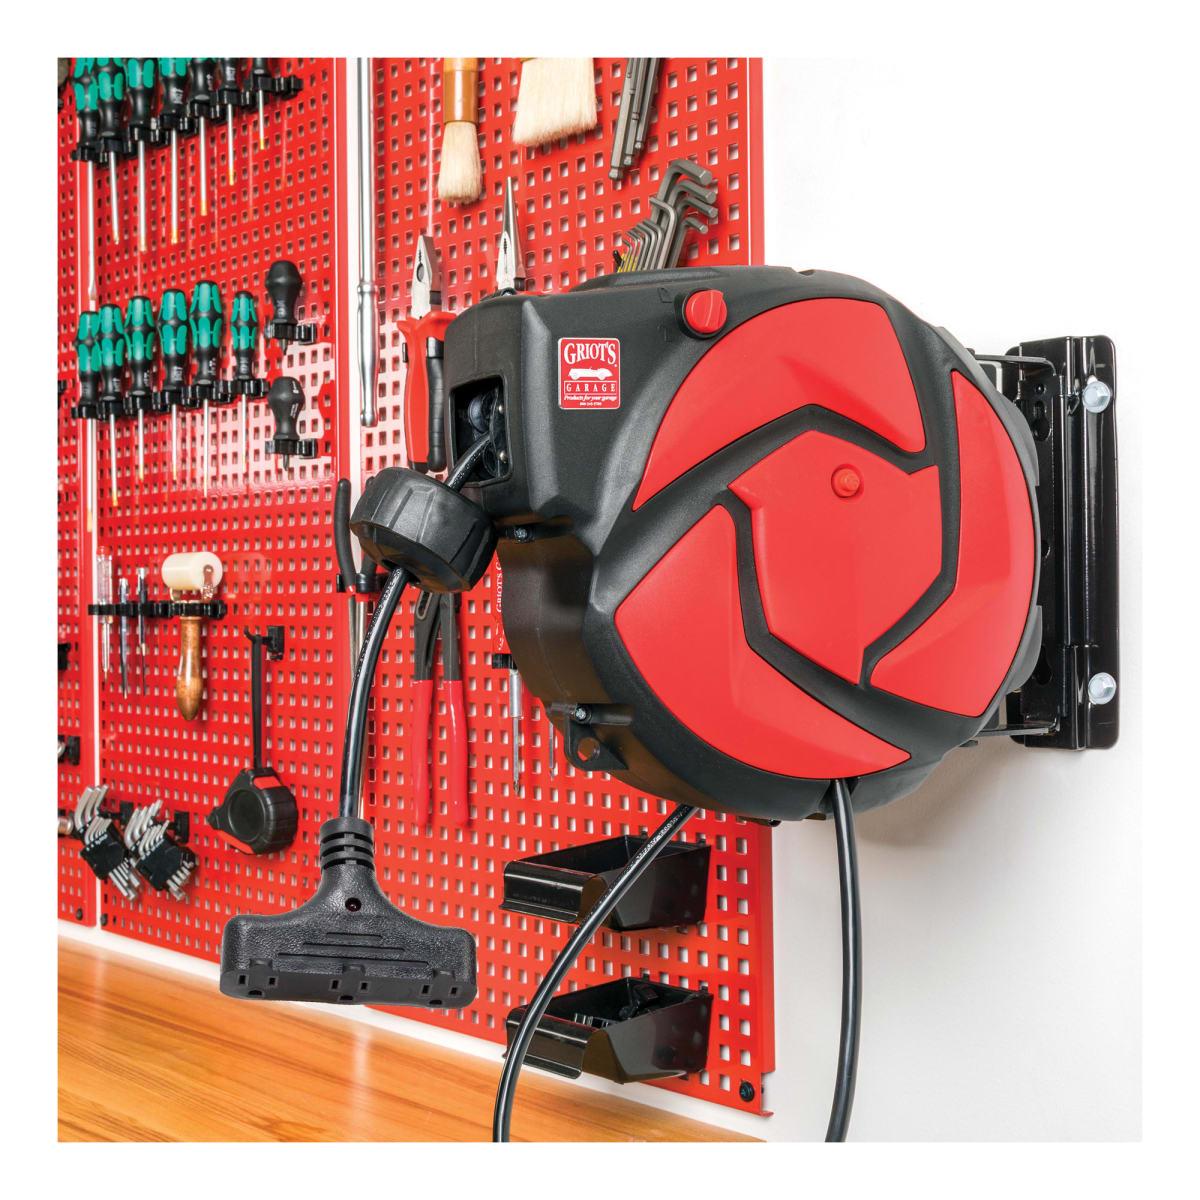 Retractable Extension Cord Reel 45 Foot Griot S Garage